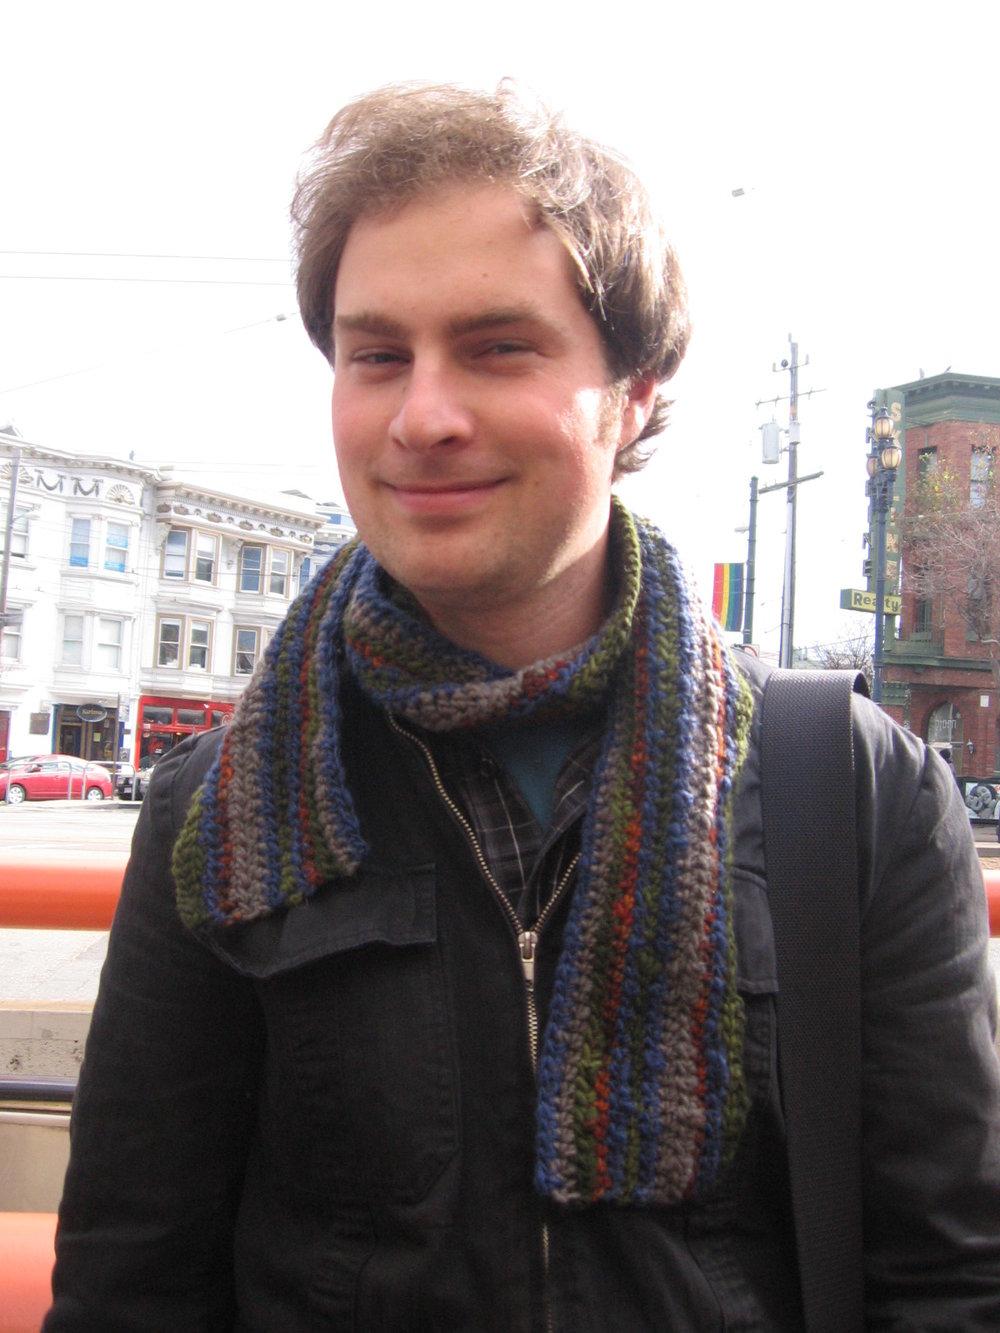 Model: Brendan Aanes